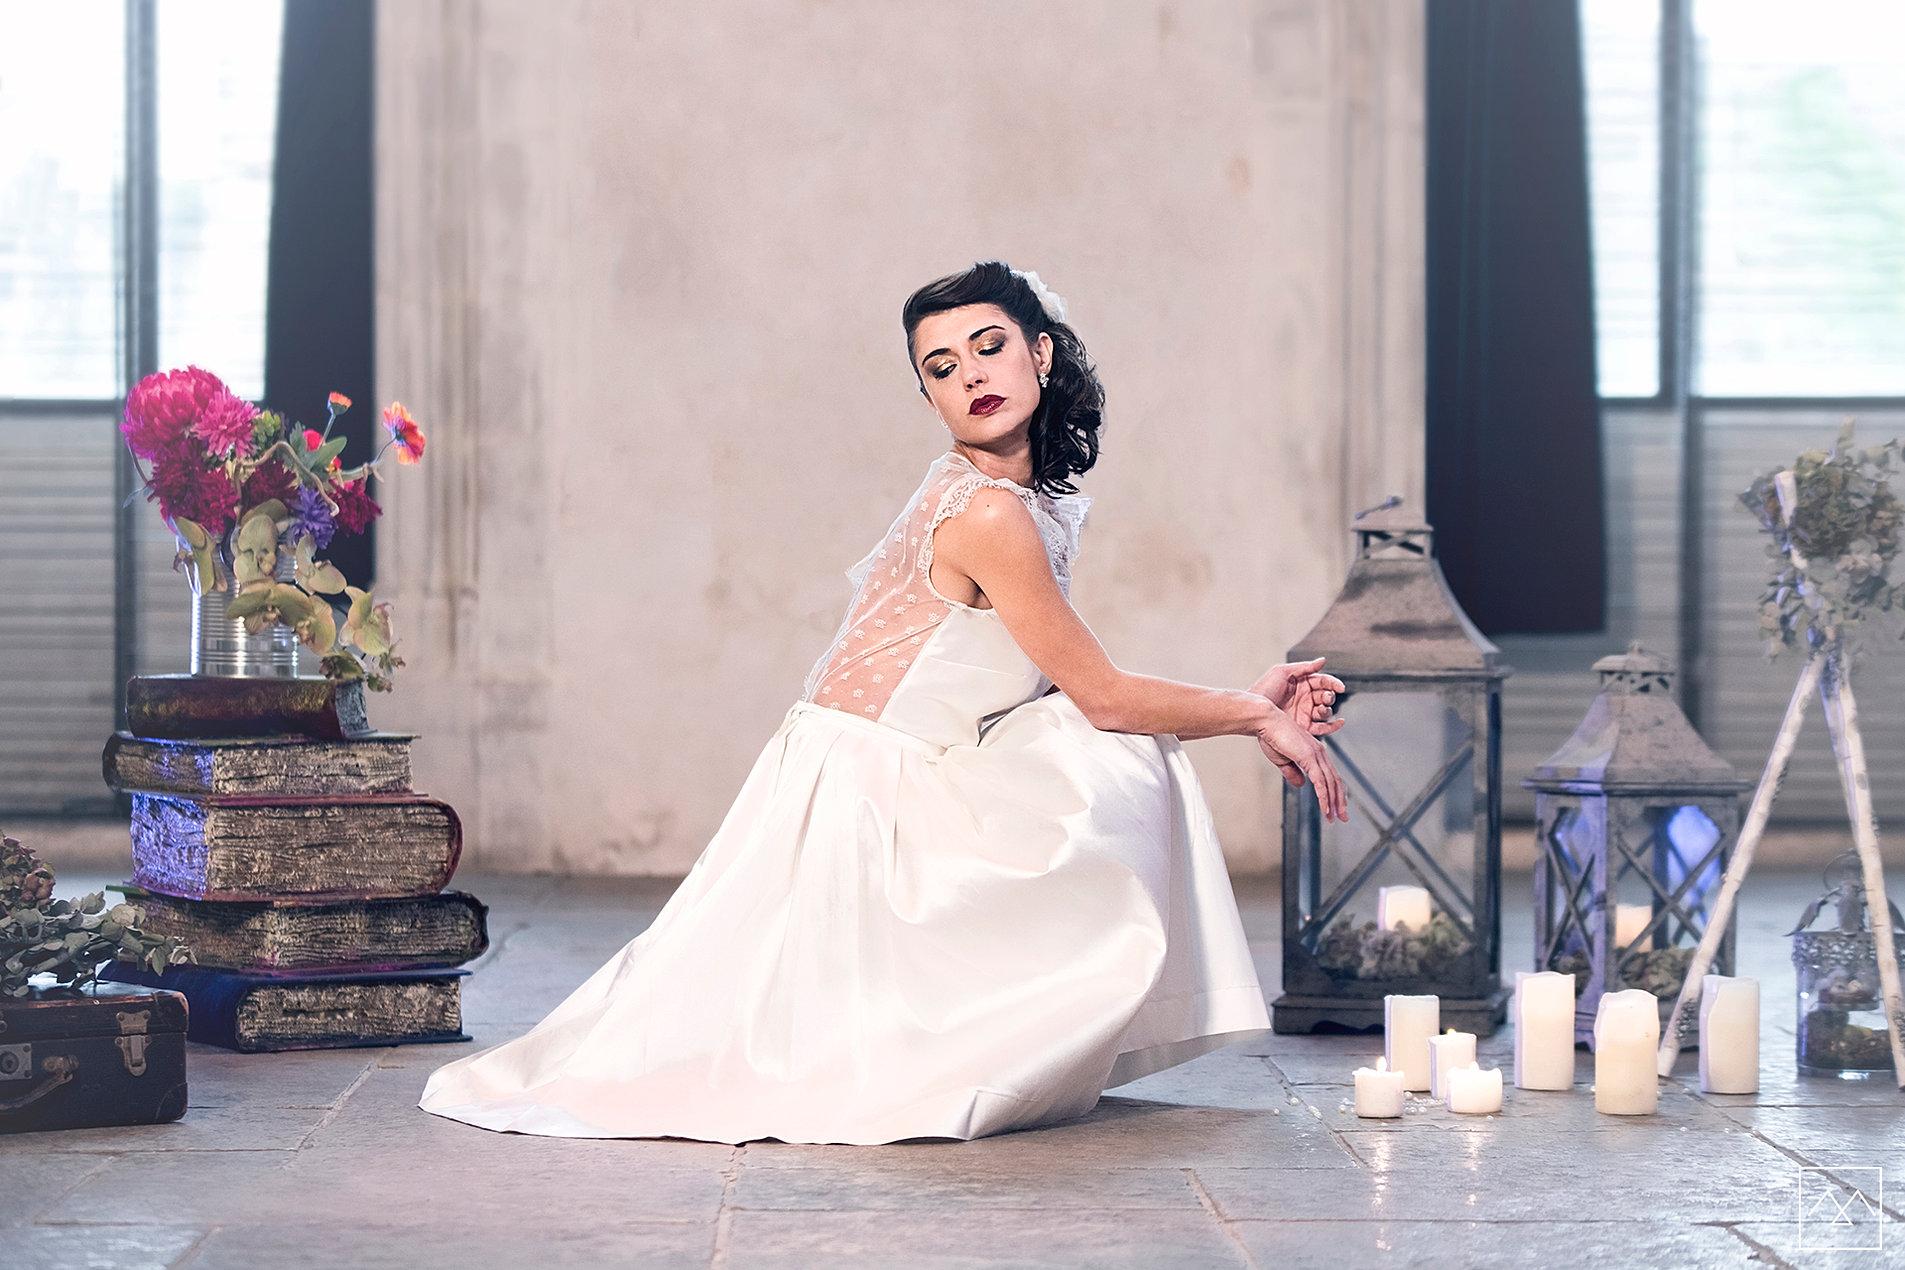 9 anna cruz maquillage et coiffure mariage lyon shooting inspiration collection 2017 - Coiffeuse Maquilleuse Mariage Lyon